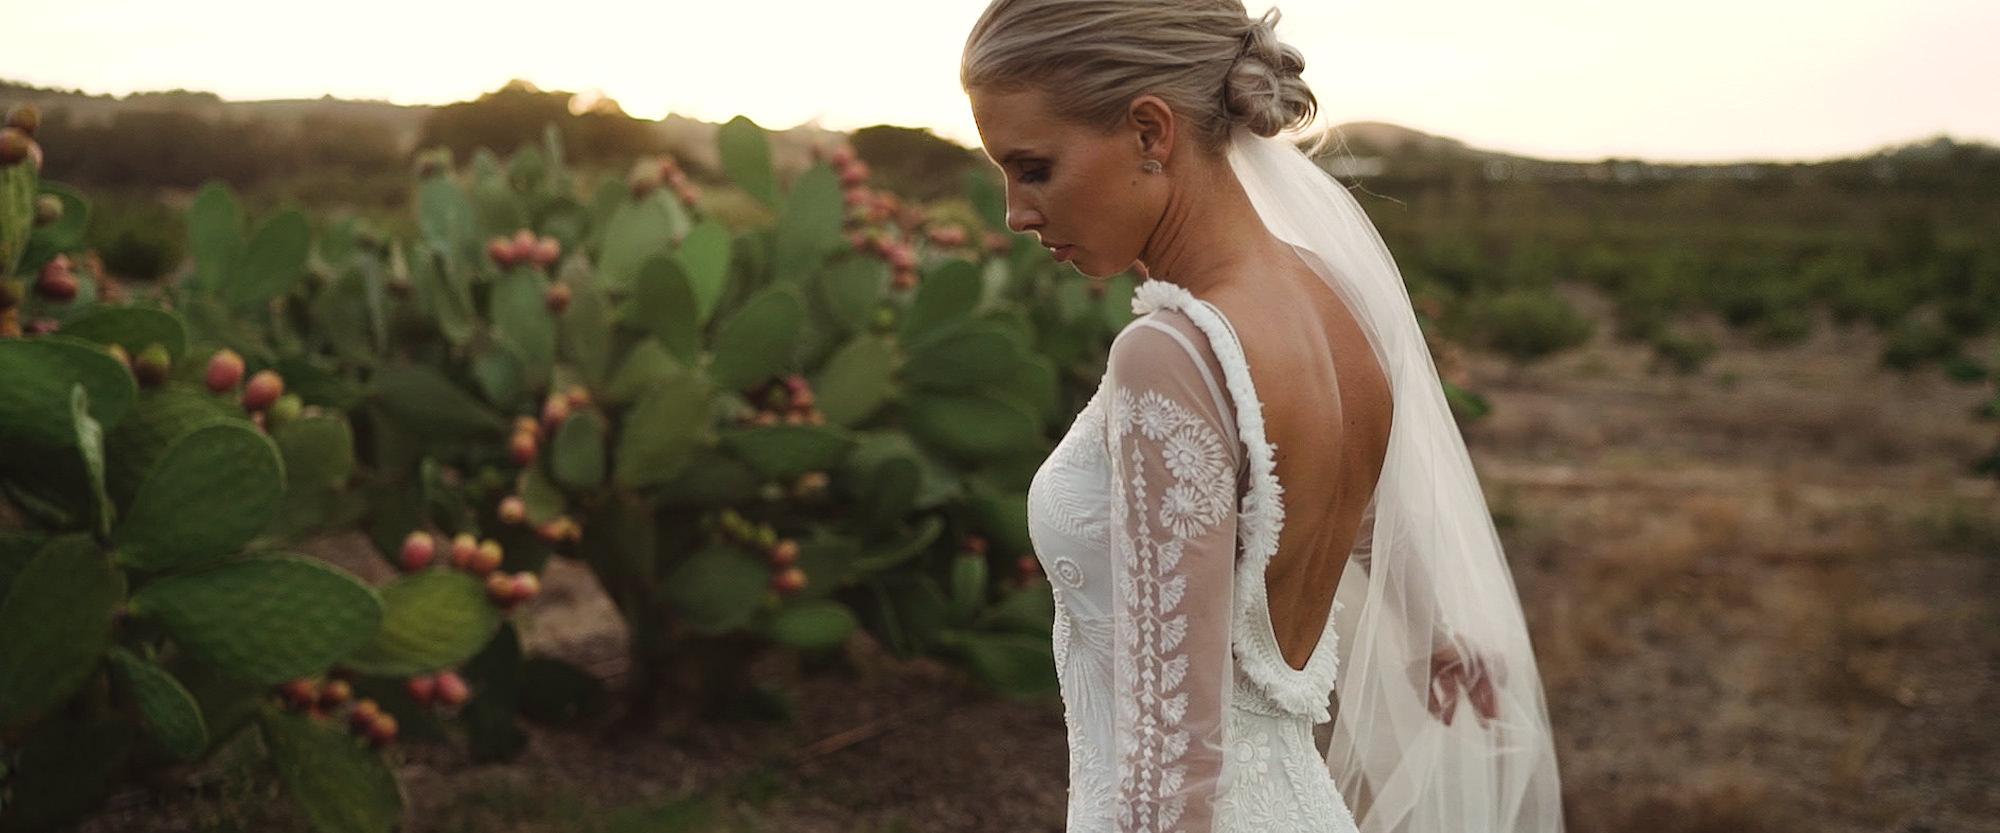 HeathEmelieWeddingFilm_Babylonstoren_Wedding_8.jpg